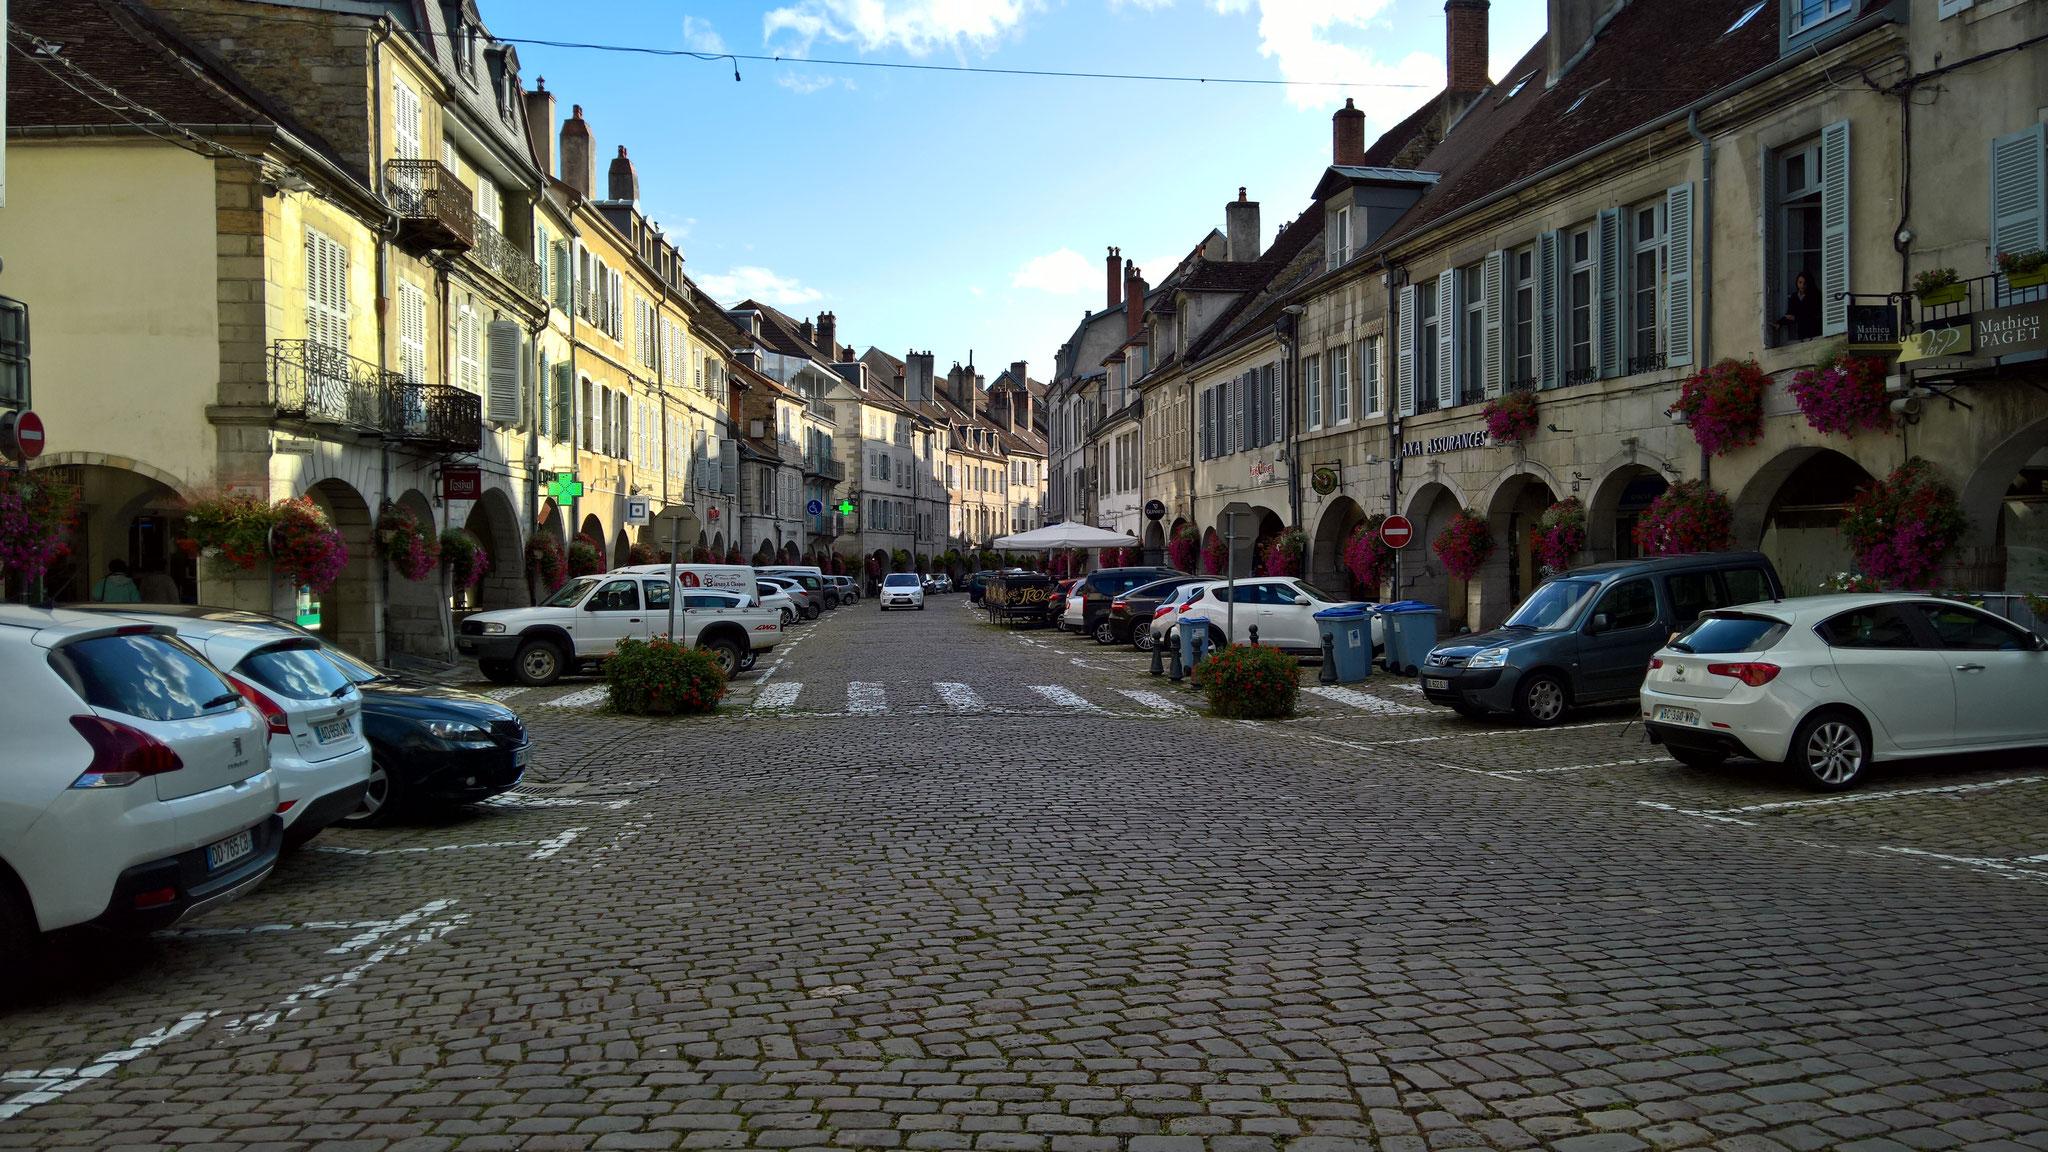 Ausflug nach Lons-le-Saunier